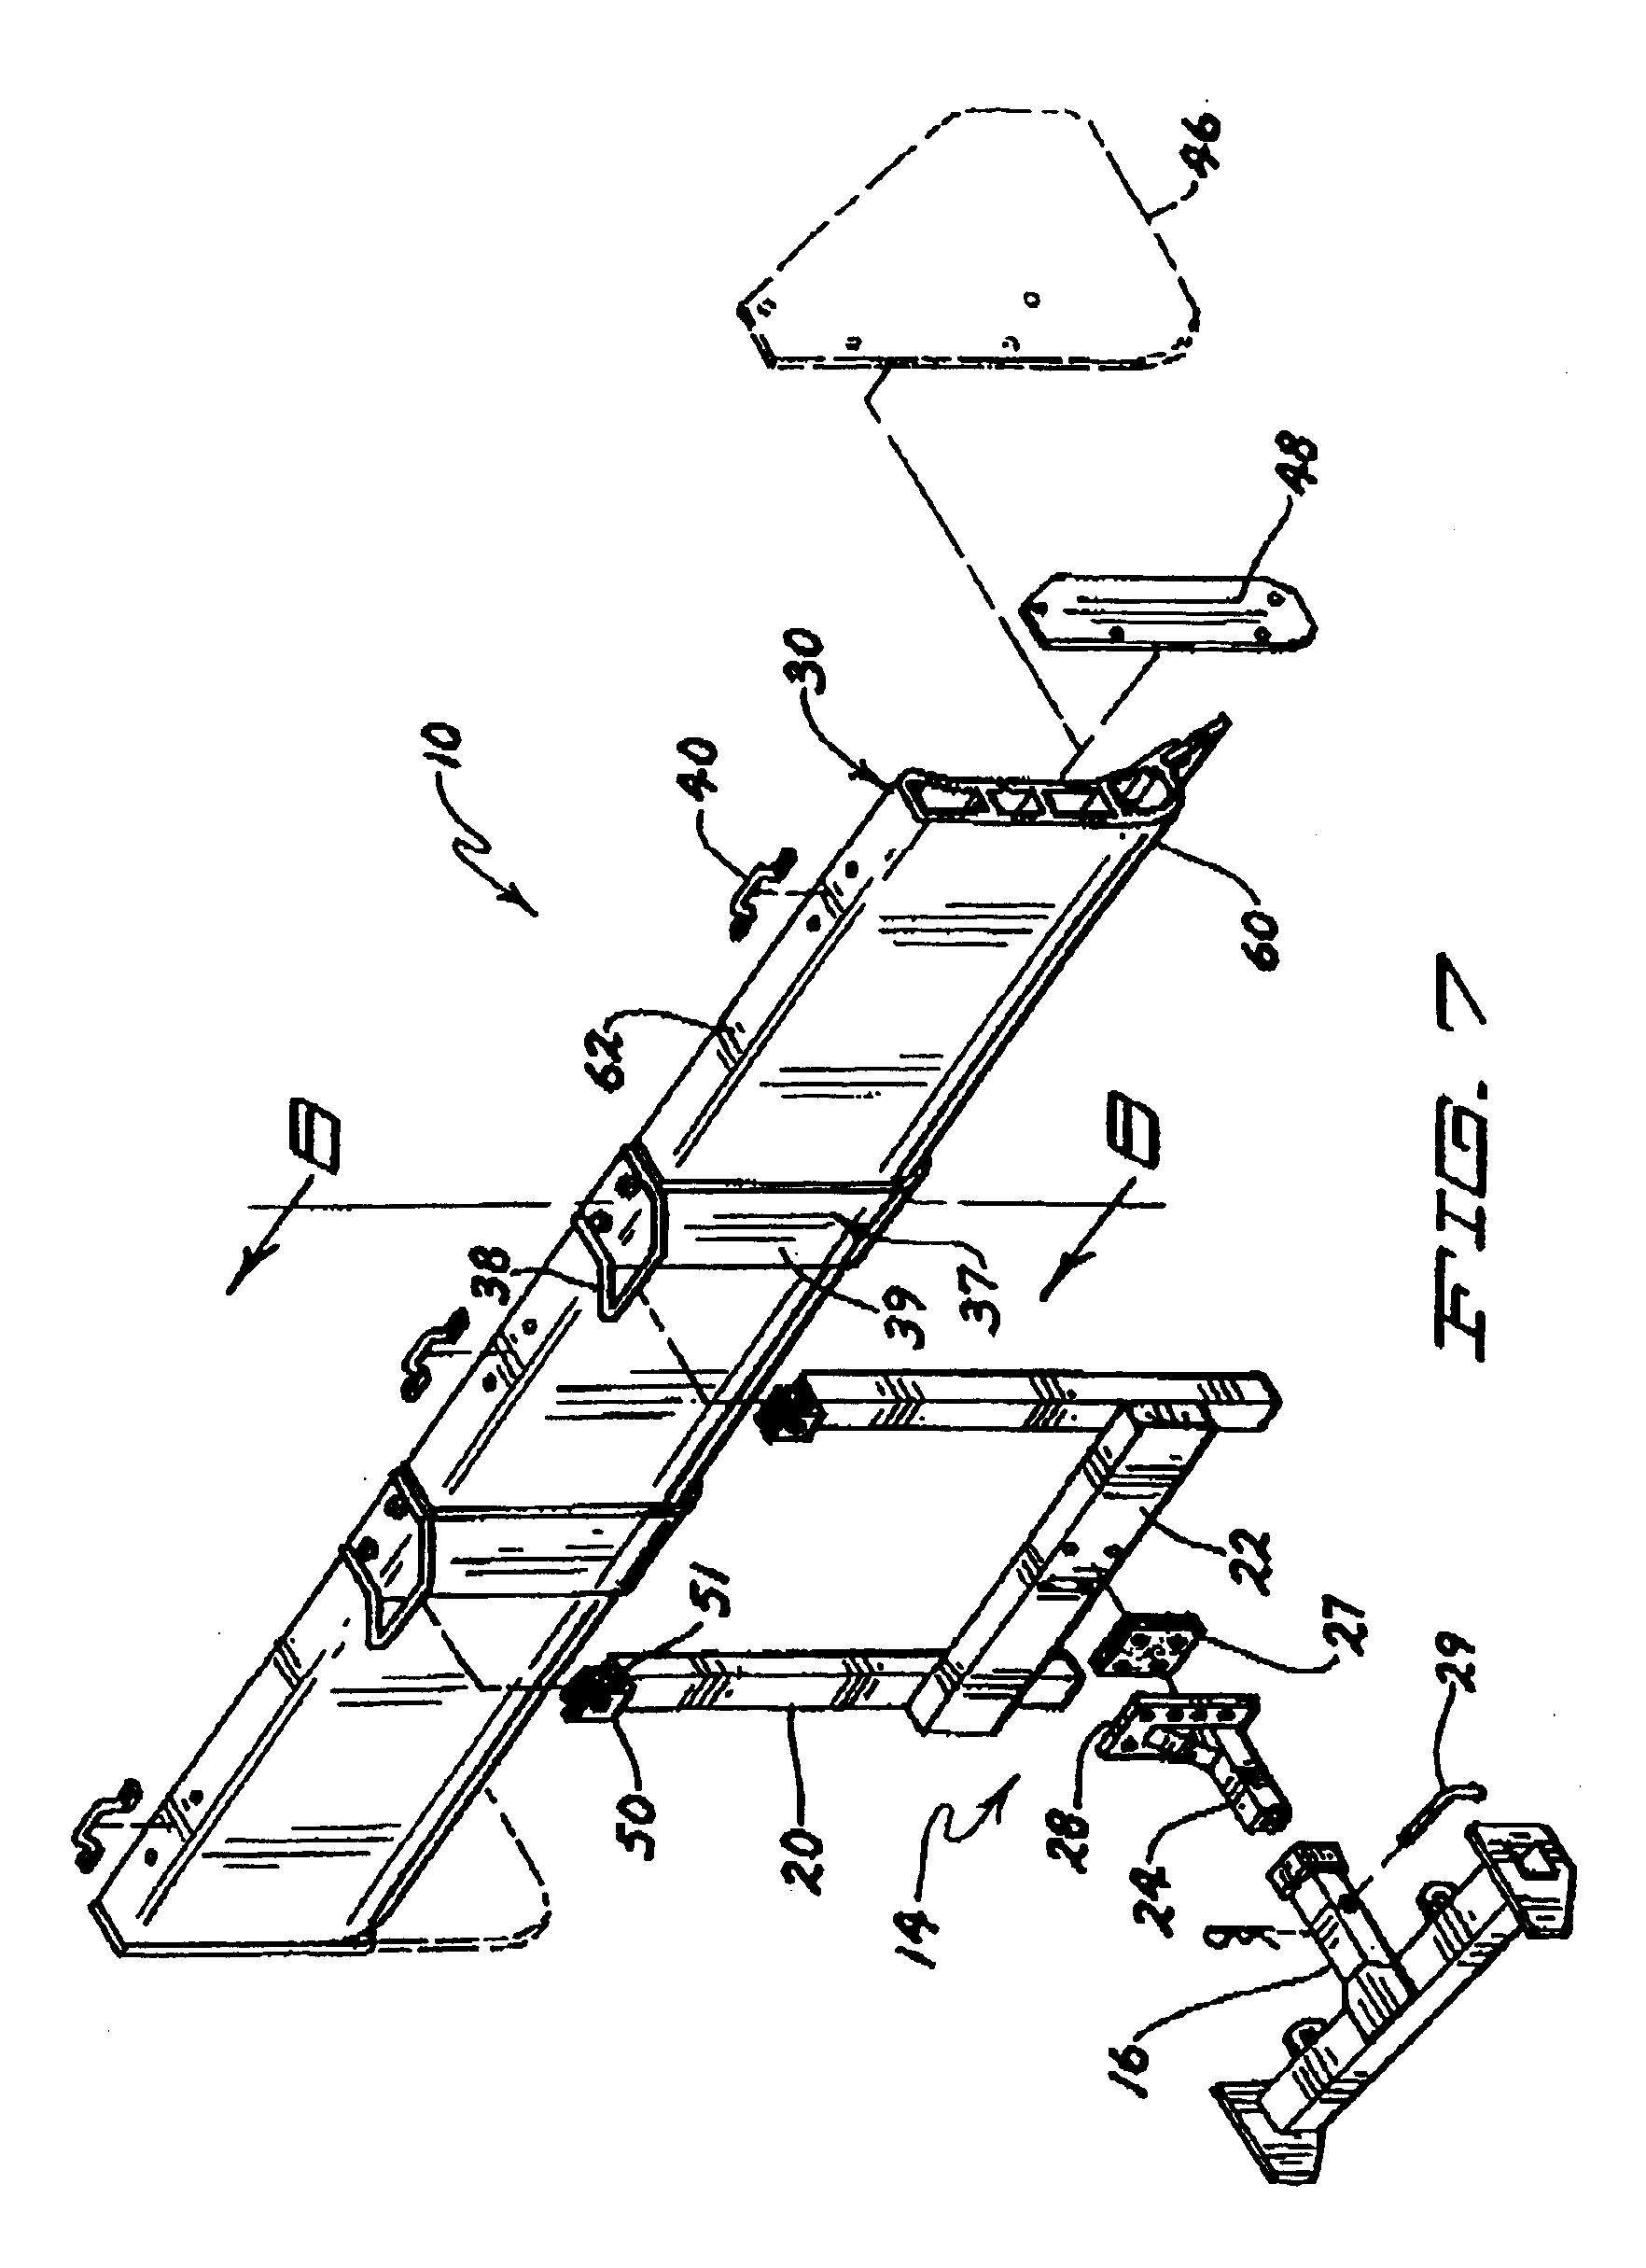 Patent us20070056193 snow plow having wear minimizing apparatus us20070056193a1 20070315 d00004 us20070056193 leo plow wiring diagram